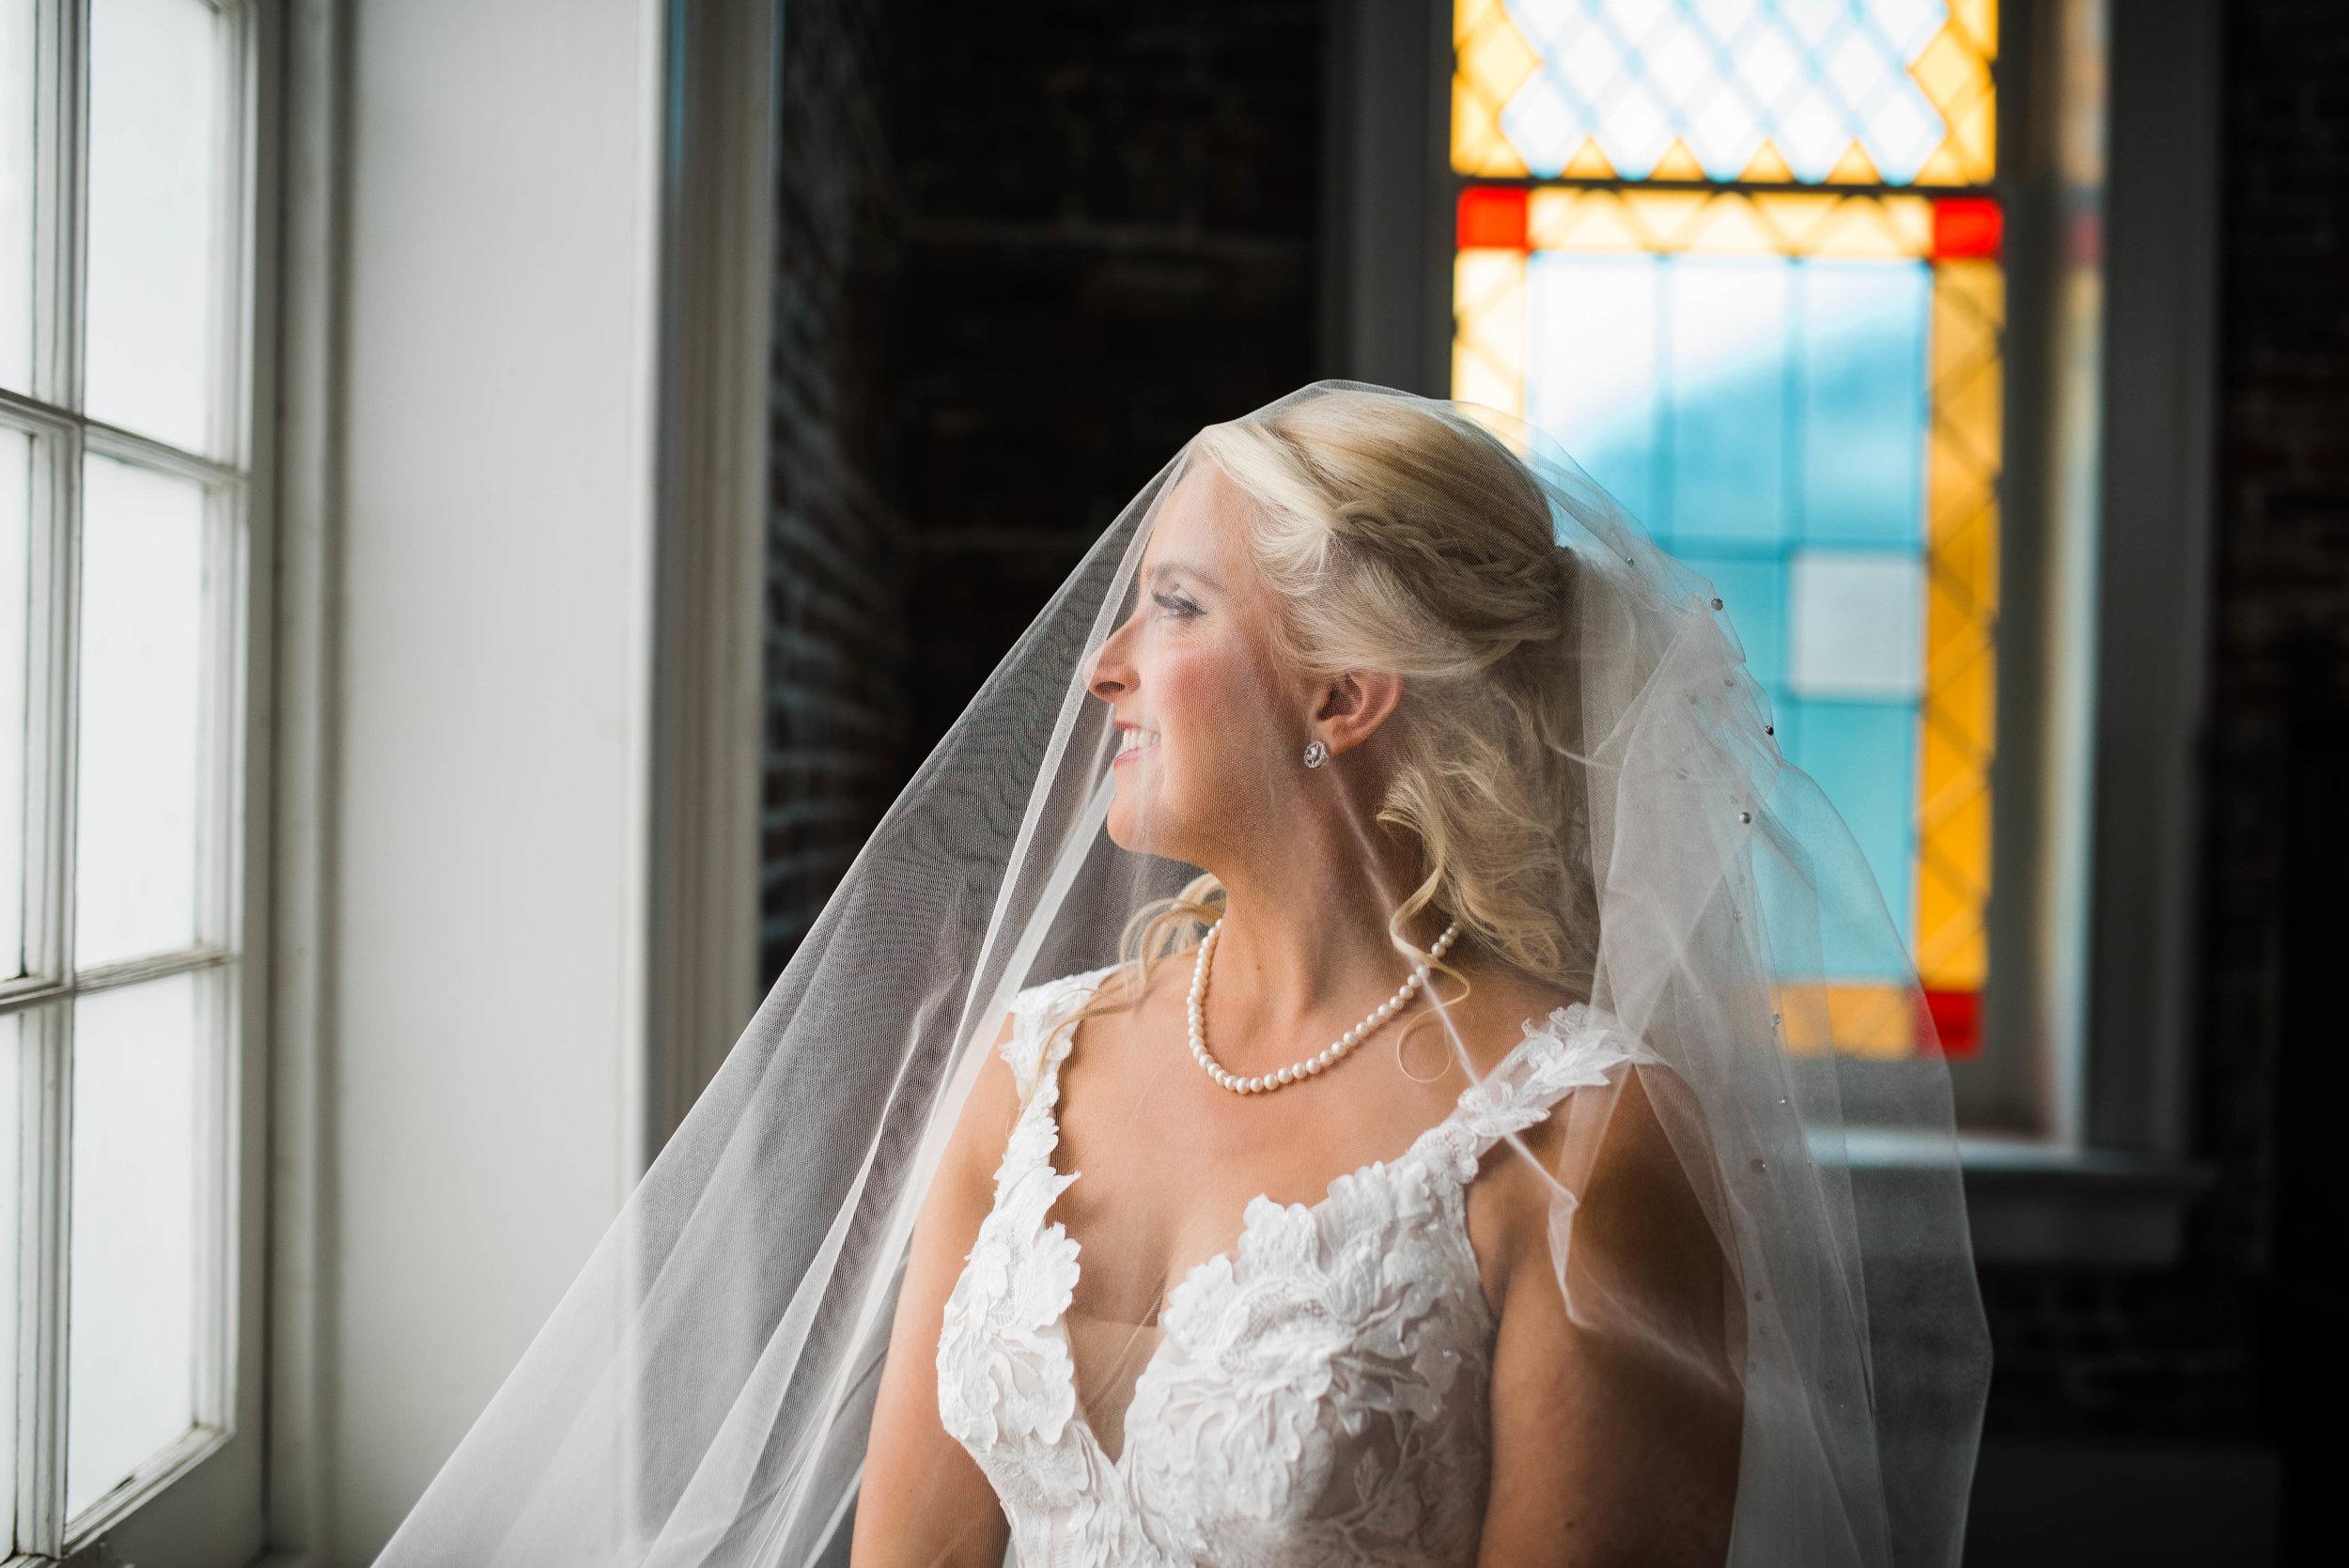 Kate-Felicity-Church-Bridal-Portraits_Gabby Chapin_Photography_Originals_00440.jpg